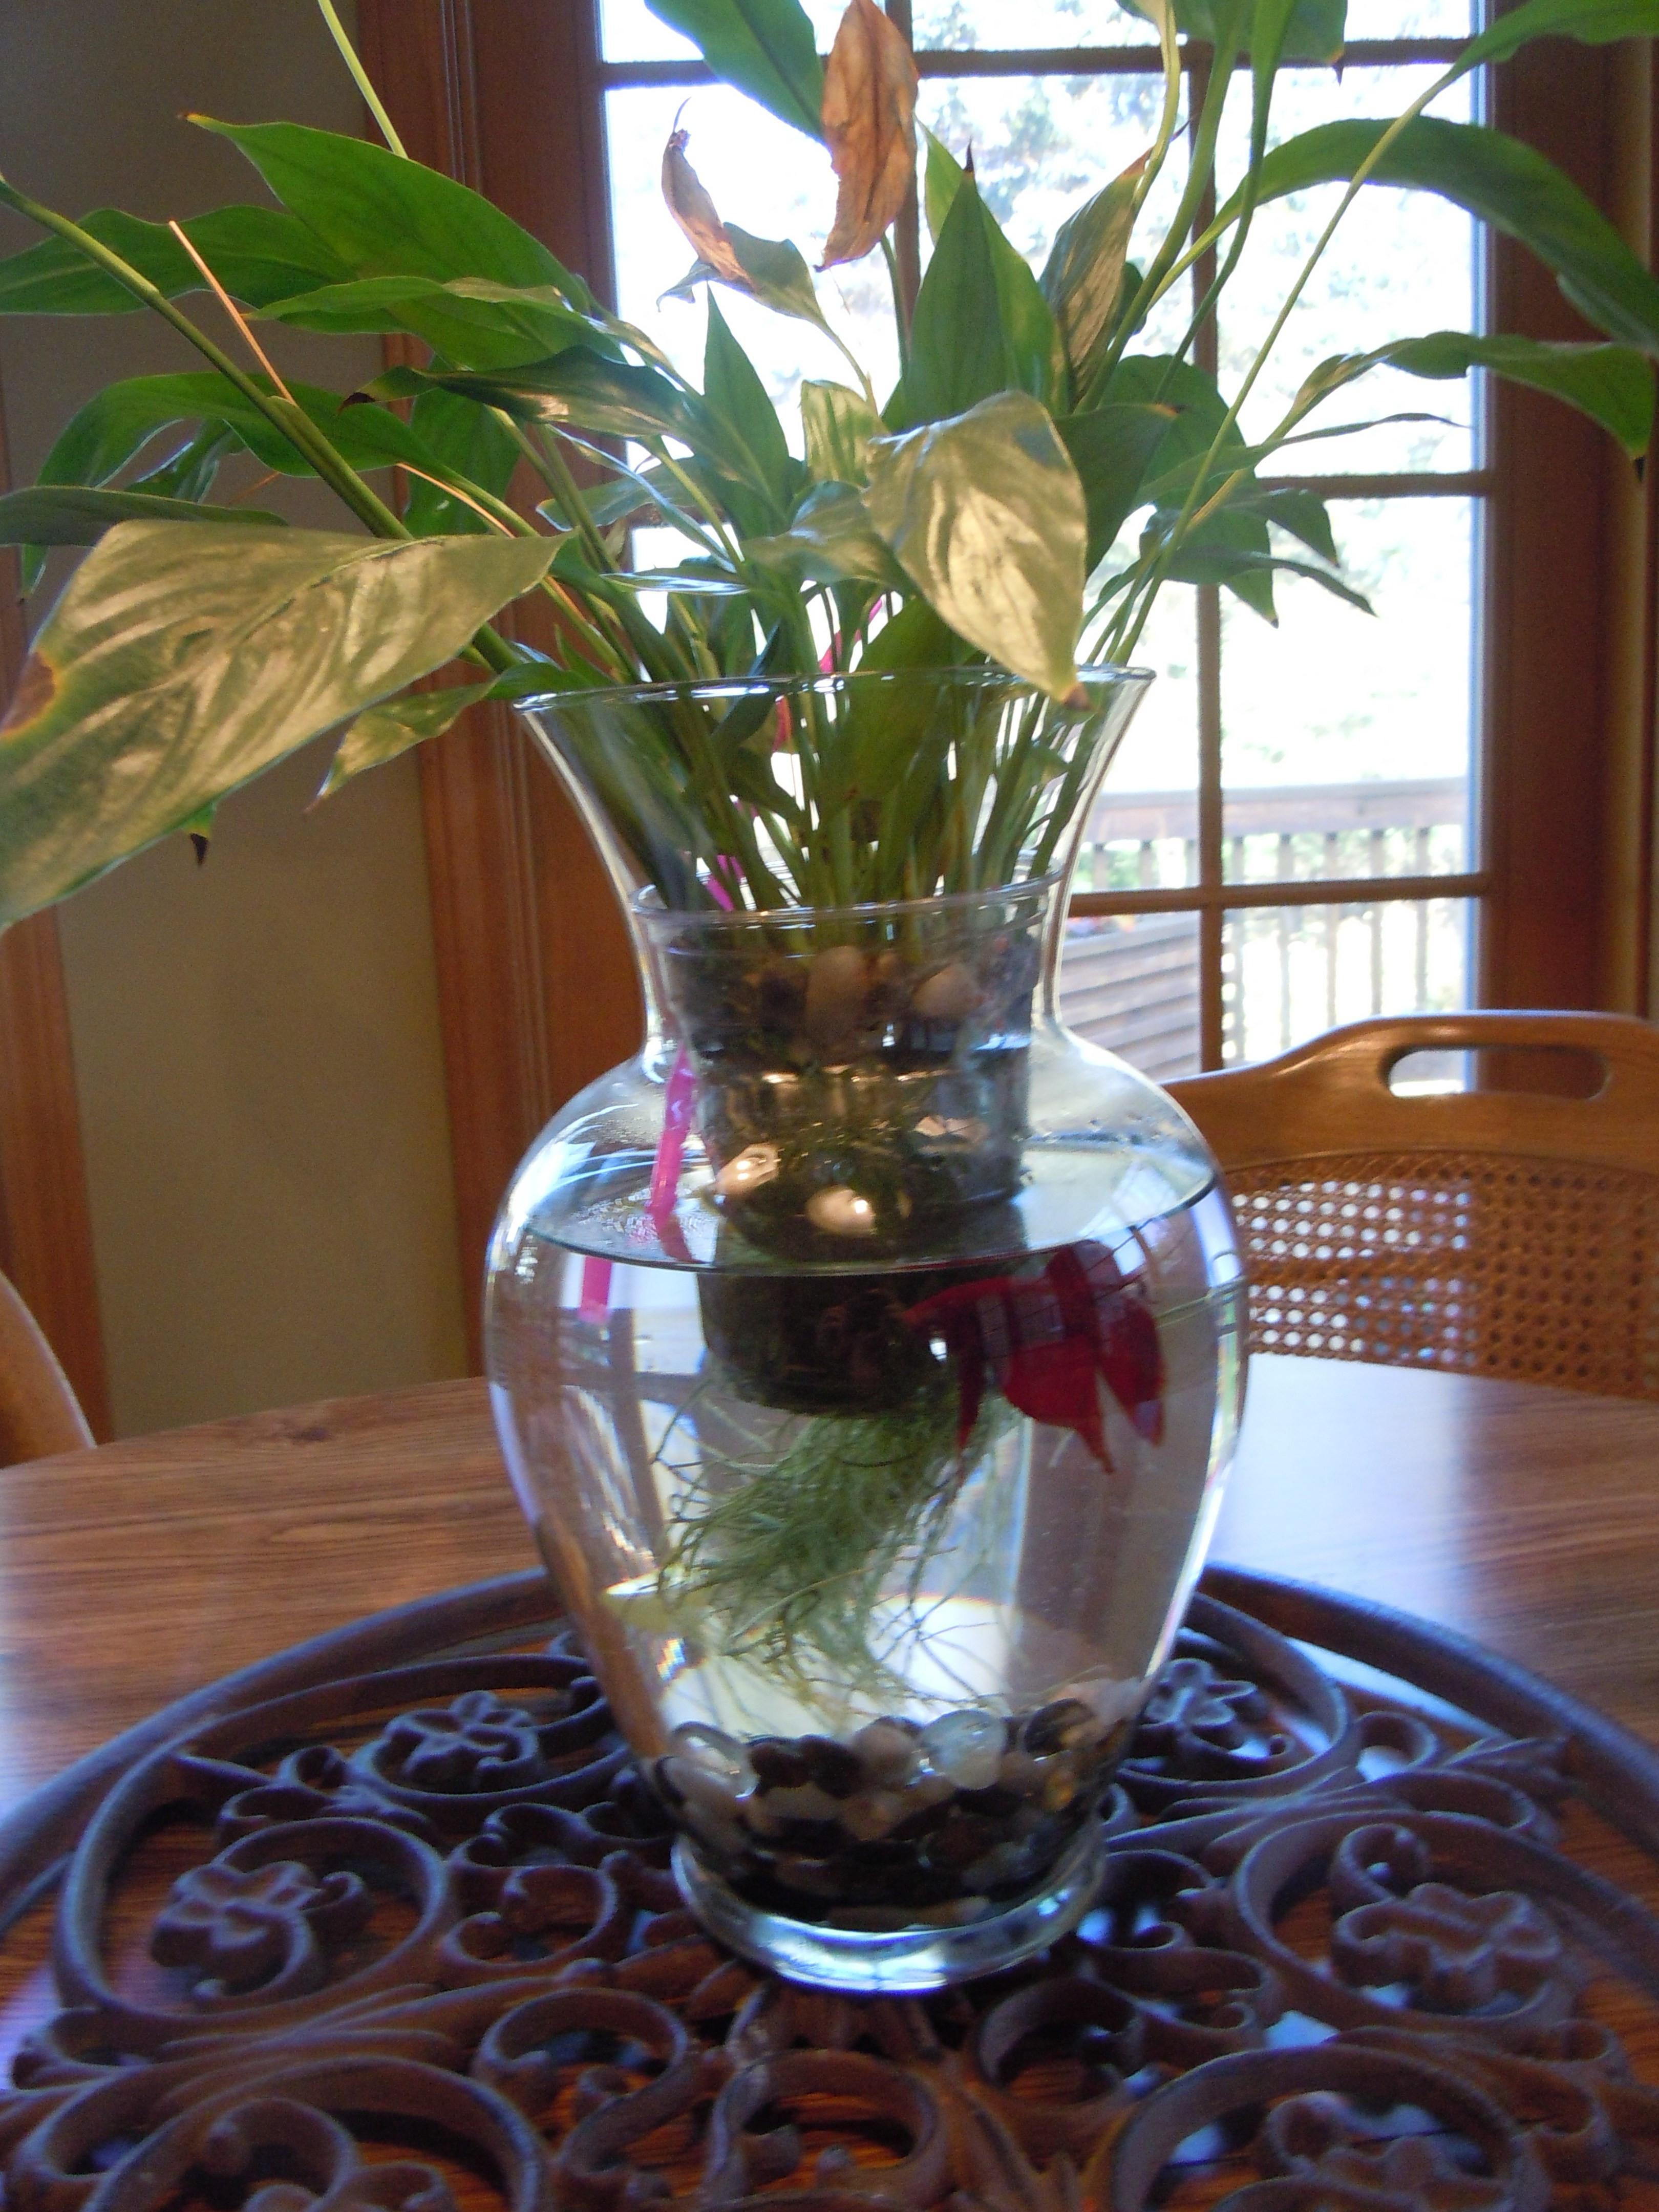 glass bird vase of crystal flower vase pictures o roselif 1 x creative tall bird vase within crystal flower vase photograph decorating ideas for vases elegant il fullxfull nny9h vases flower